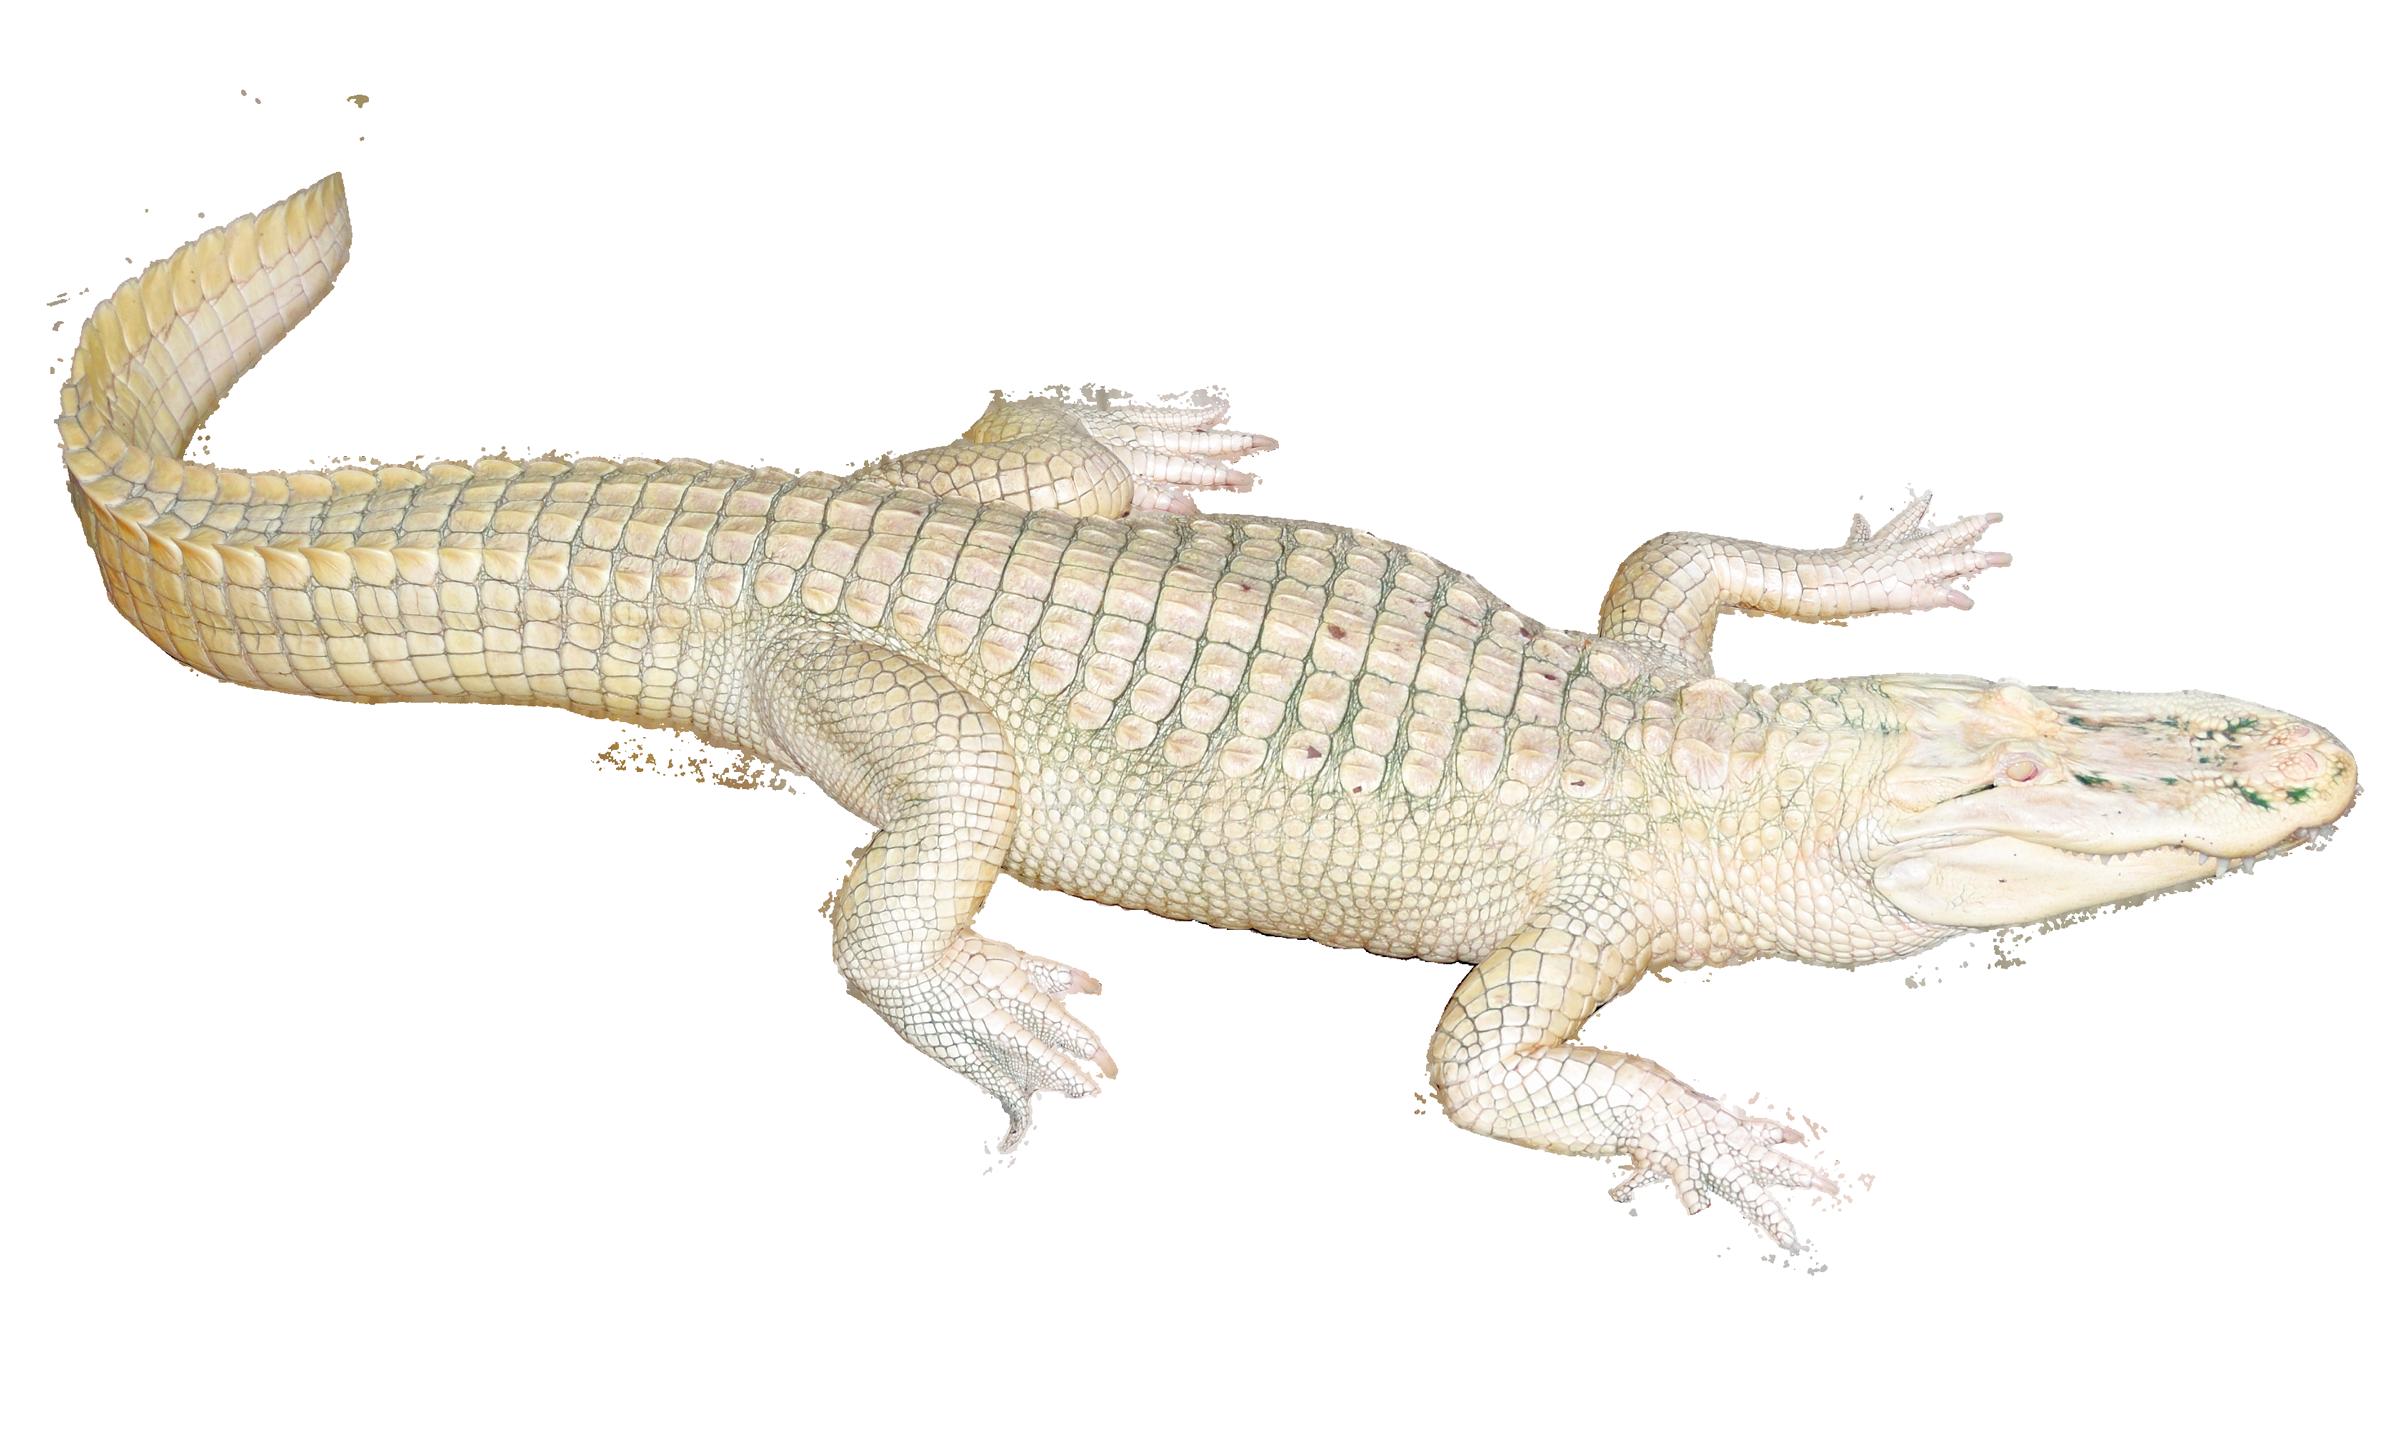 White Crocodile PNG Image